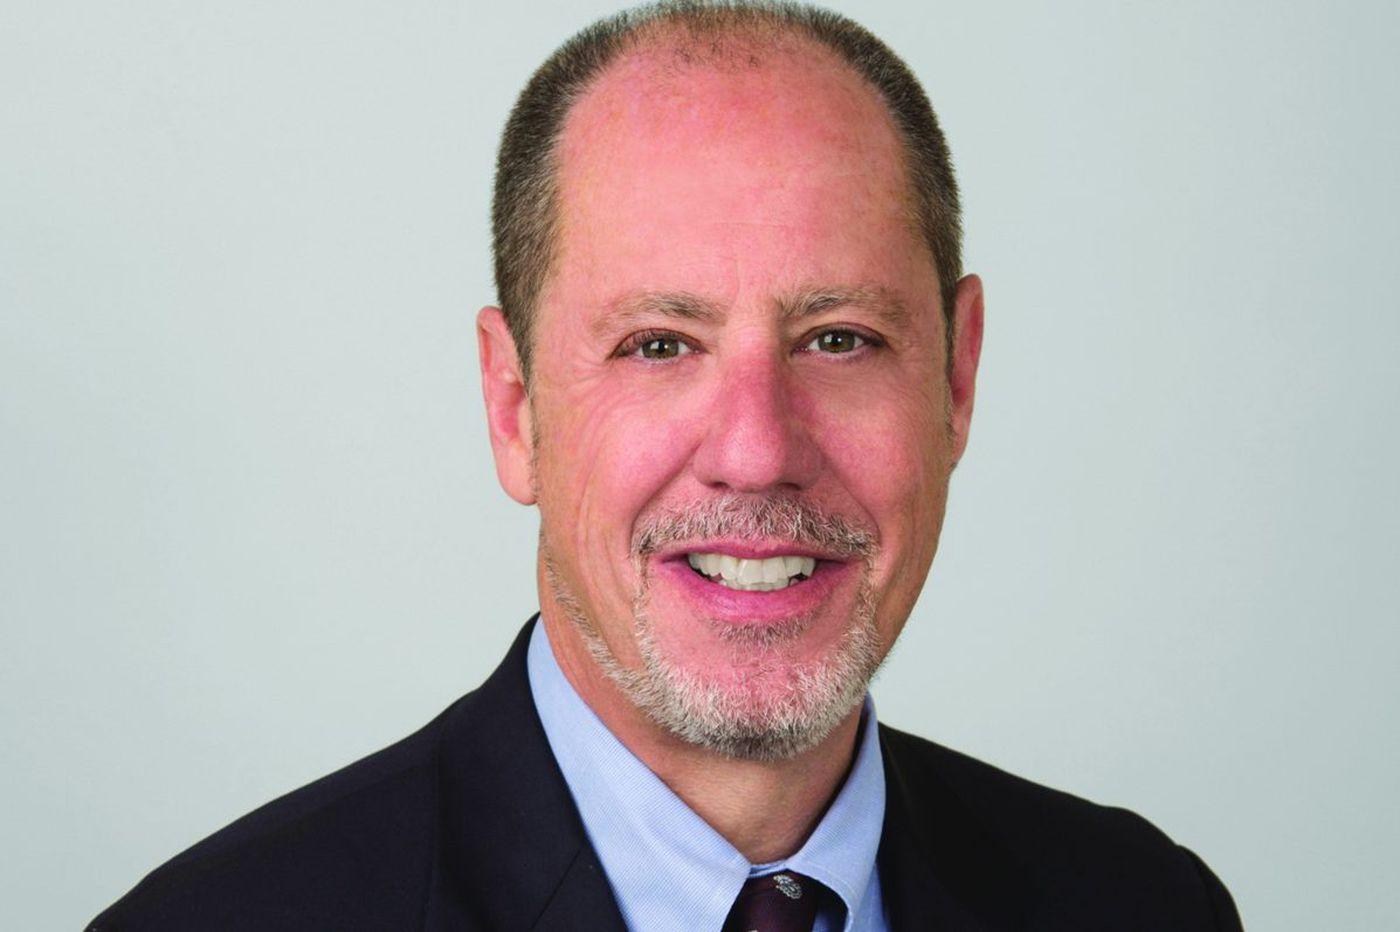 Ballard Spahr lawyer tackles media cases for CNN, New York Times